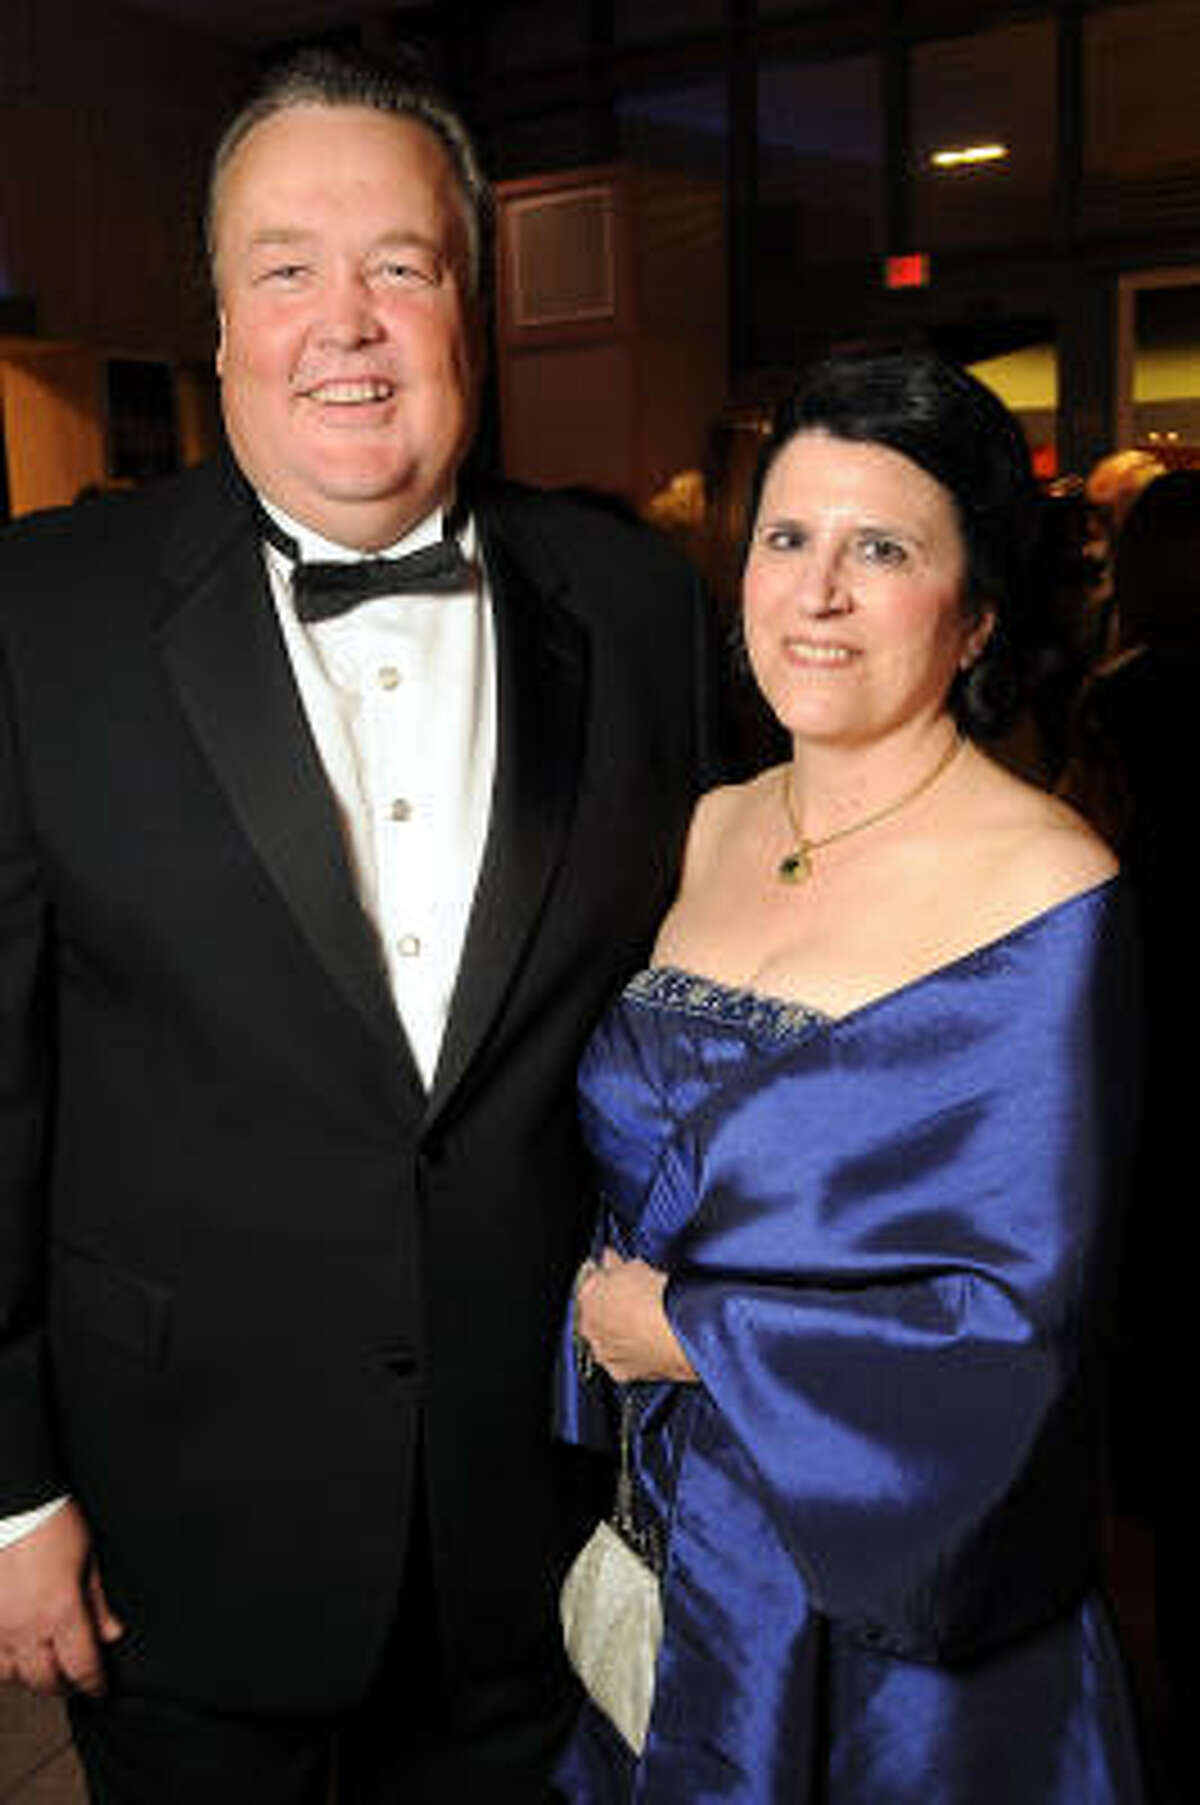 Joel Bartsch and his wife Susanne